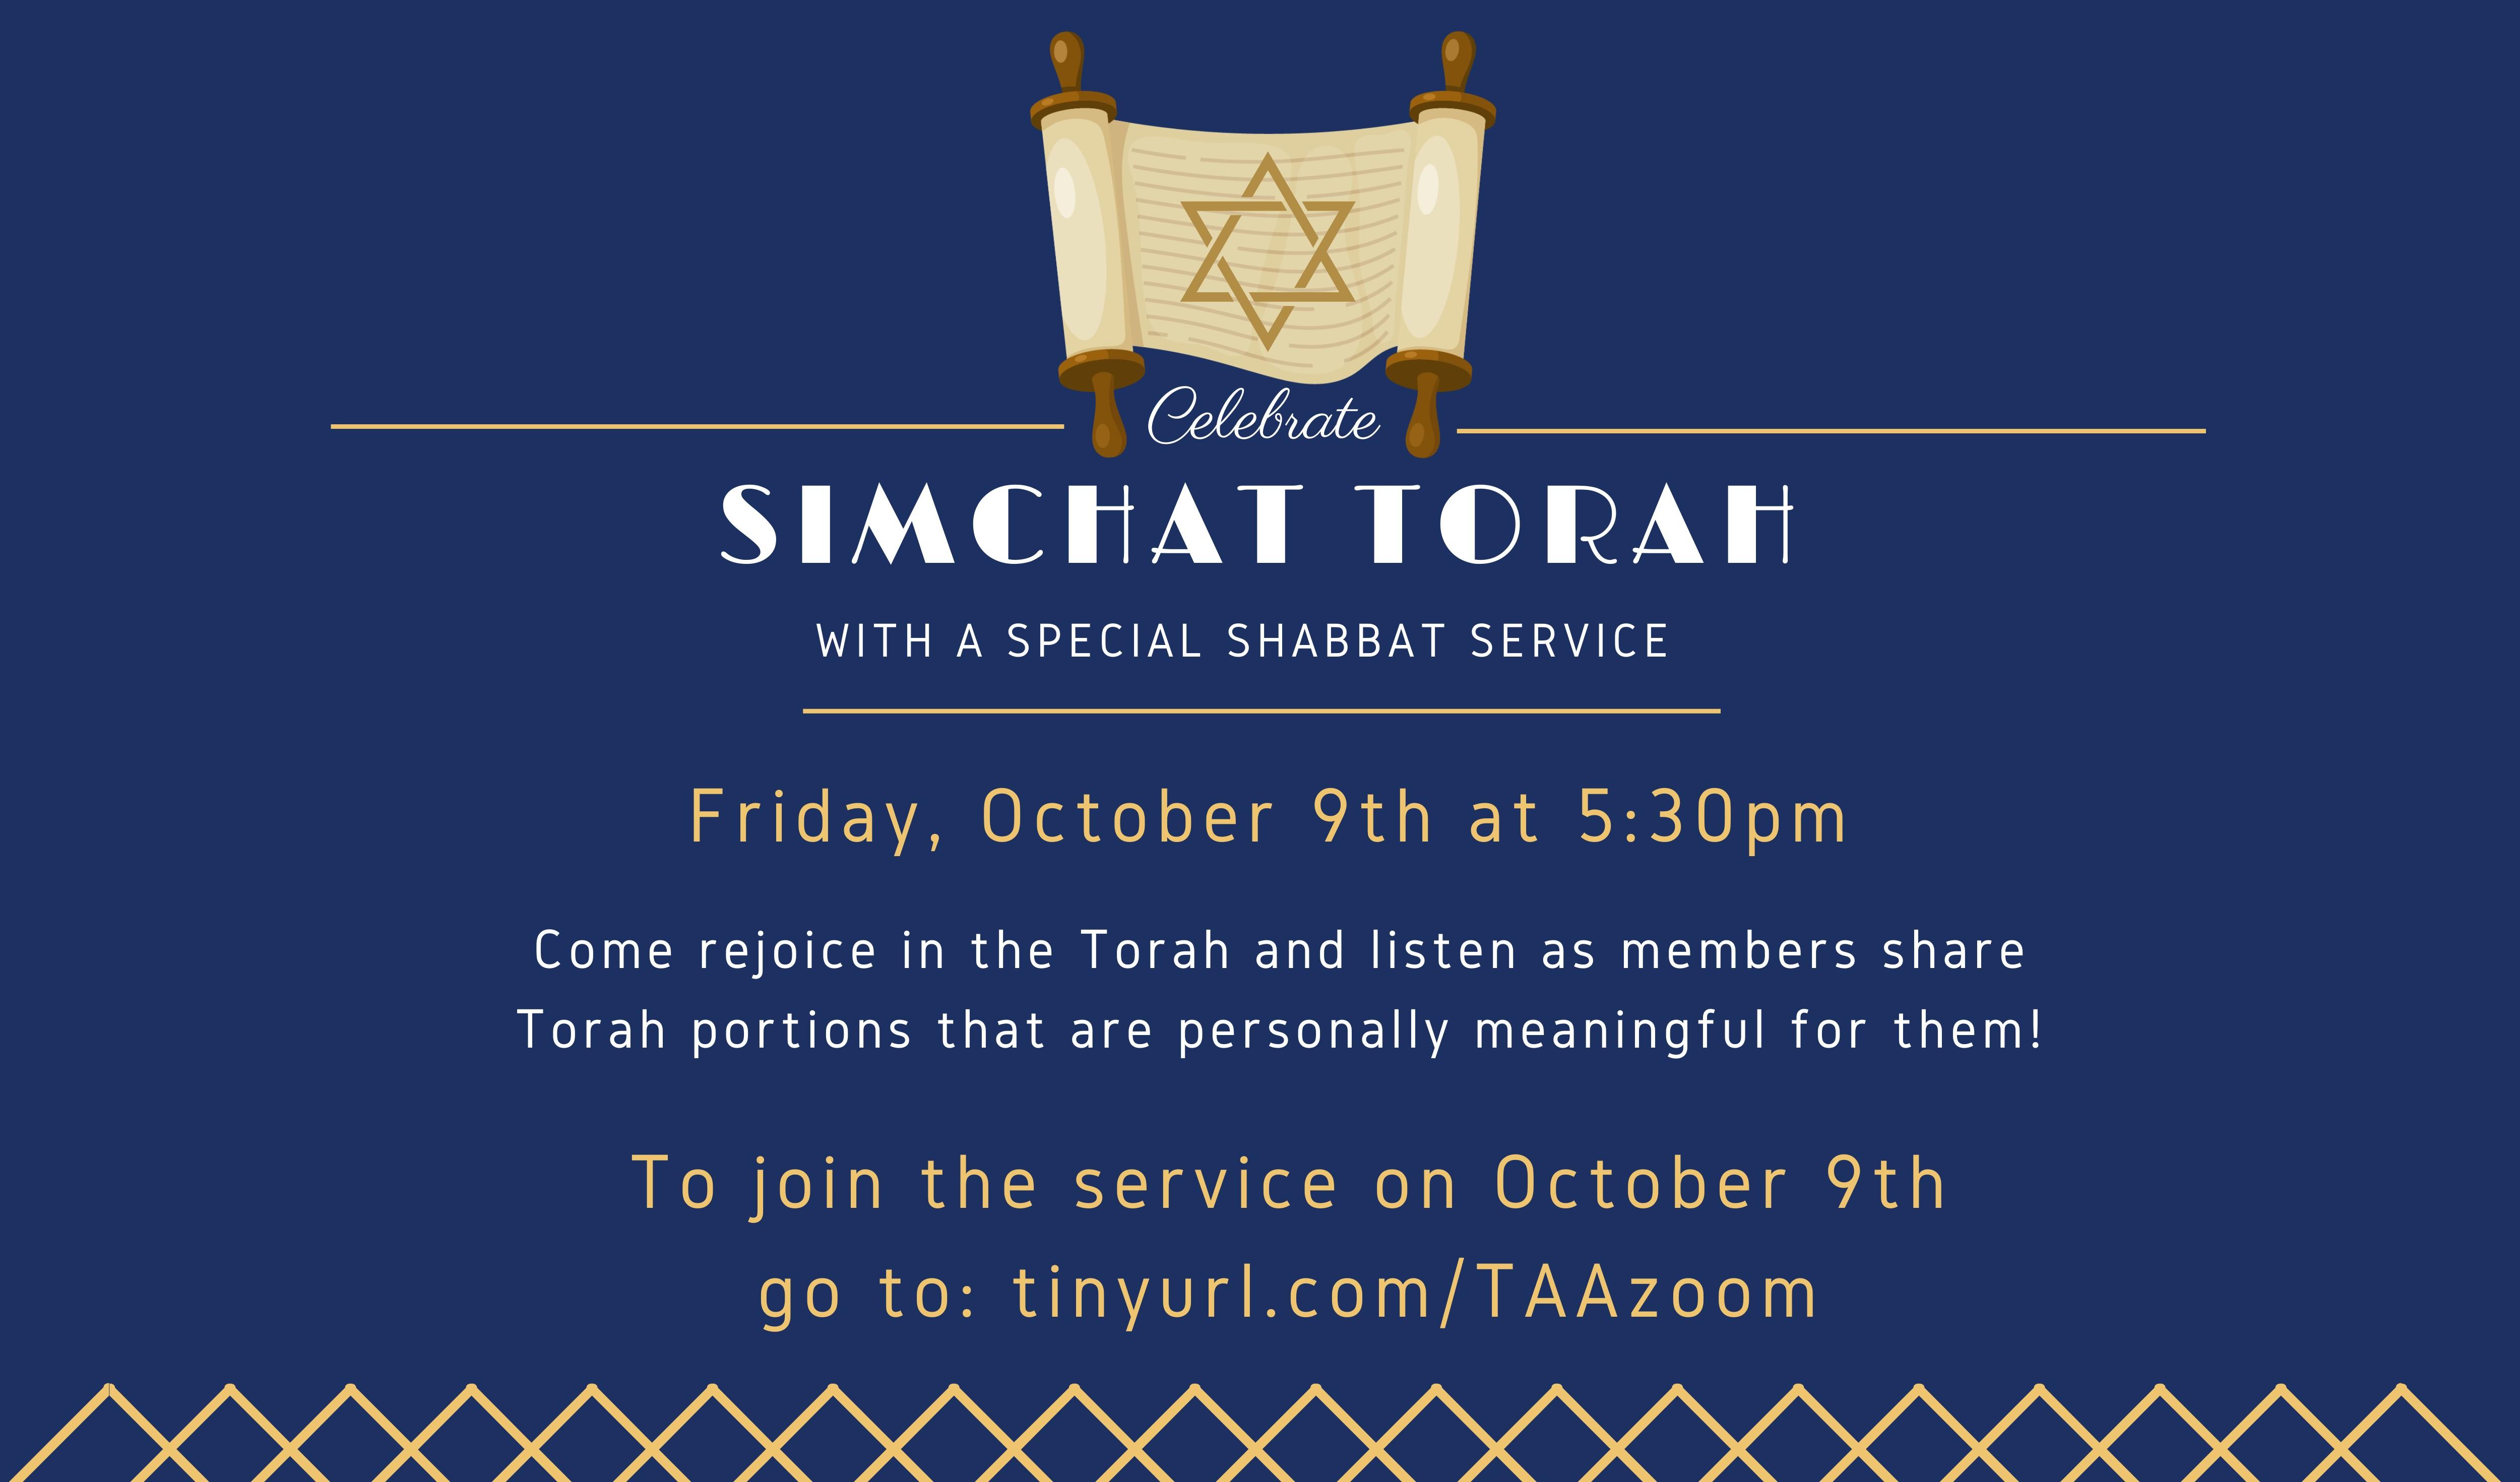 Banner Image for Simchat Torah Service